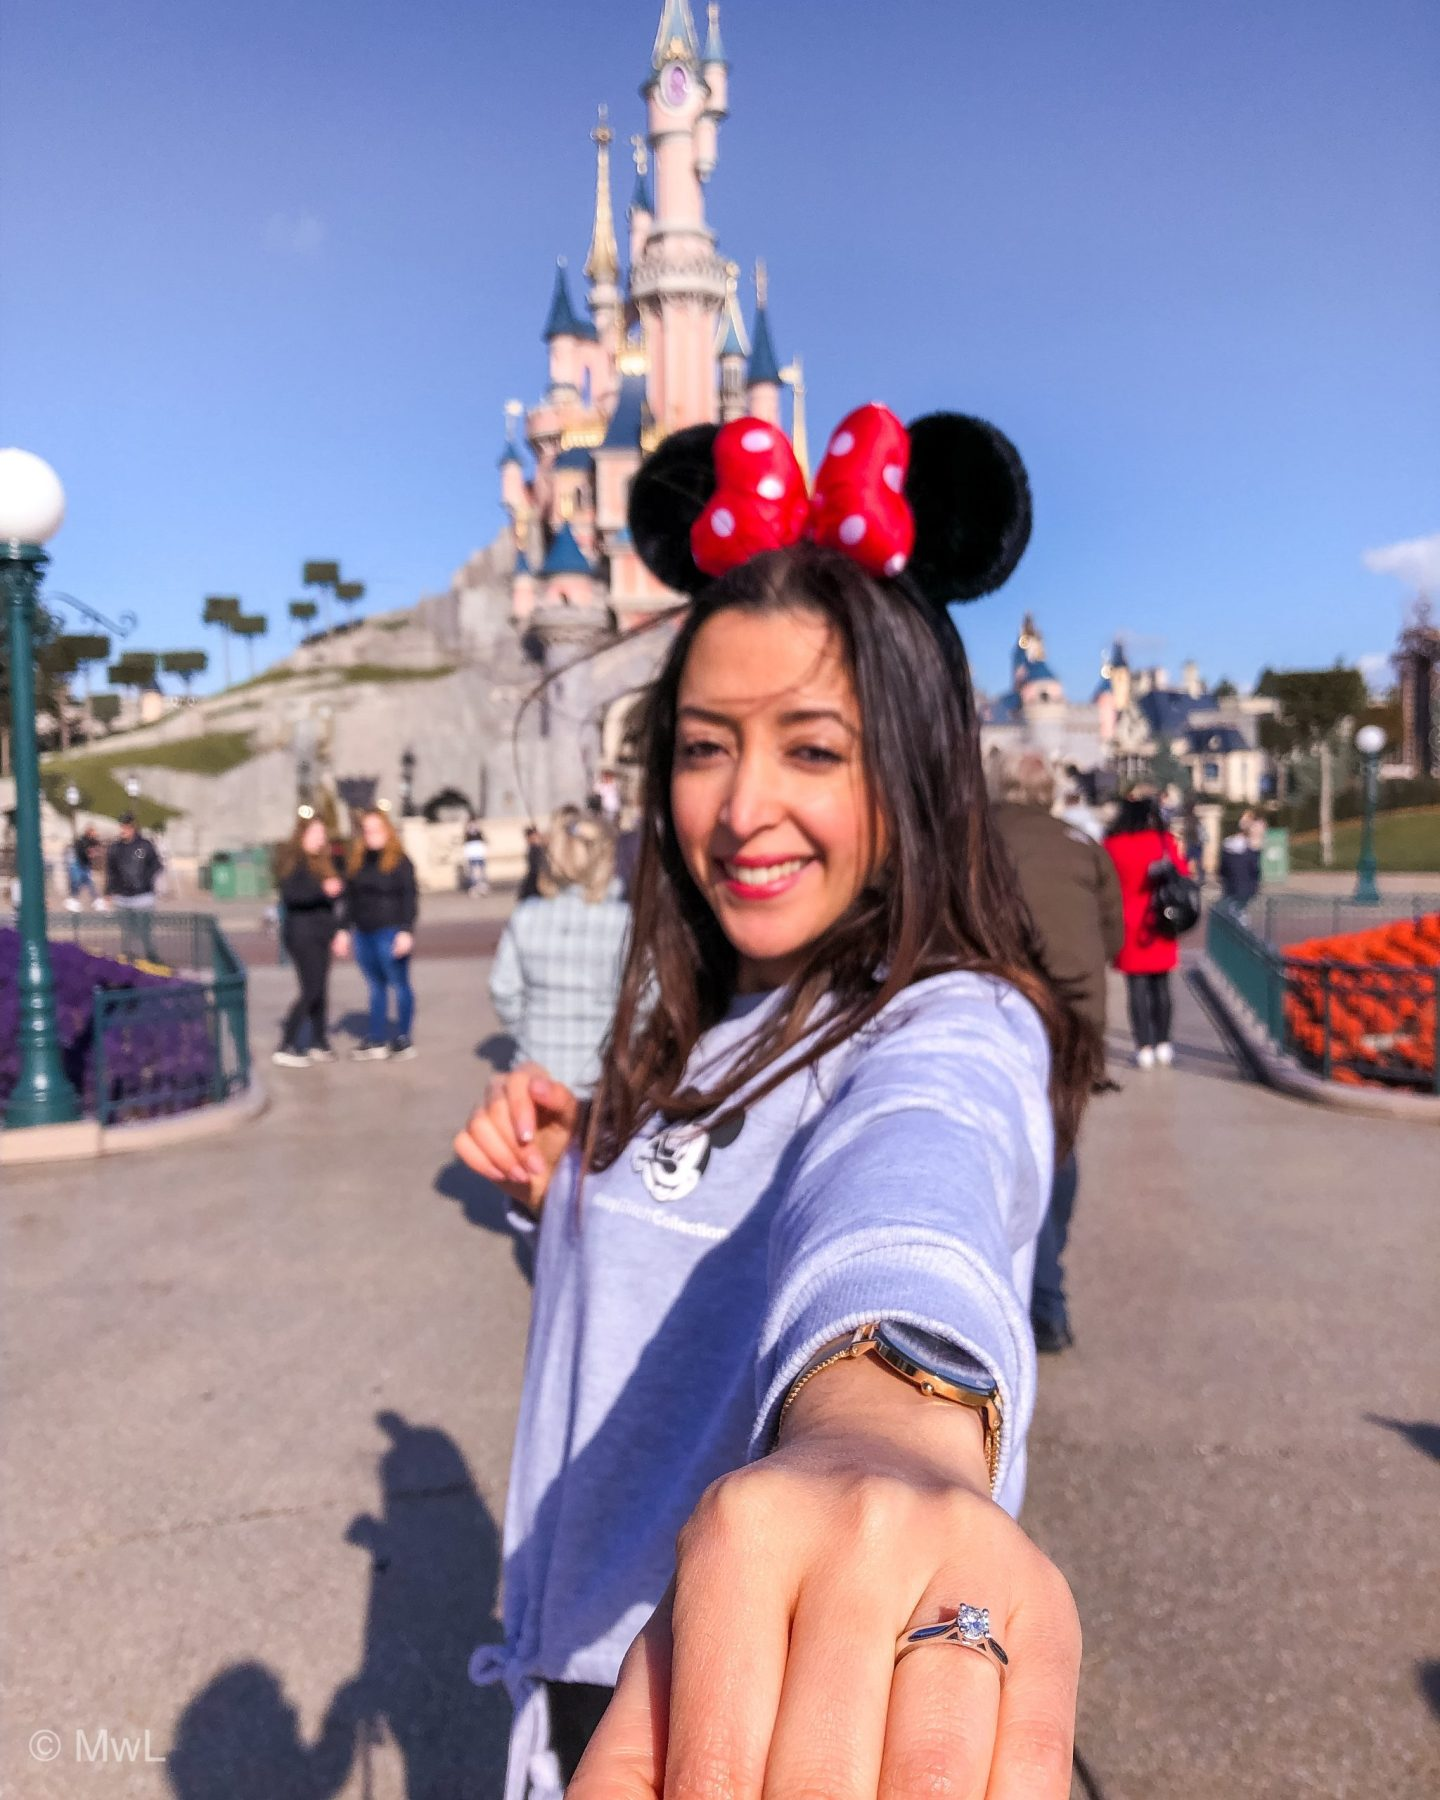 Demande en mariage pendant un weekend à DisneyLand Paris